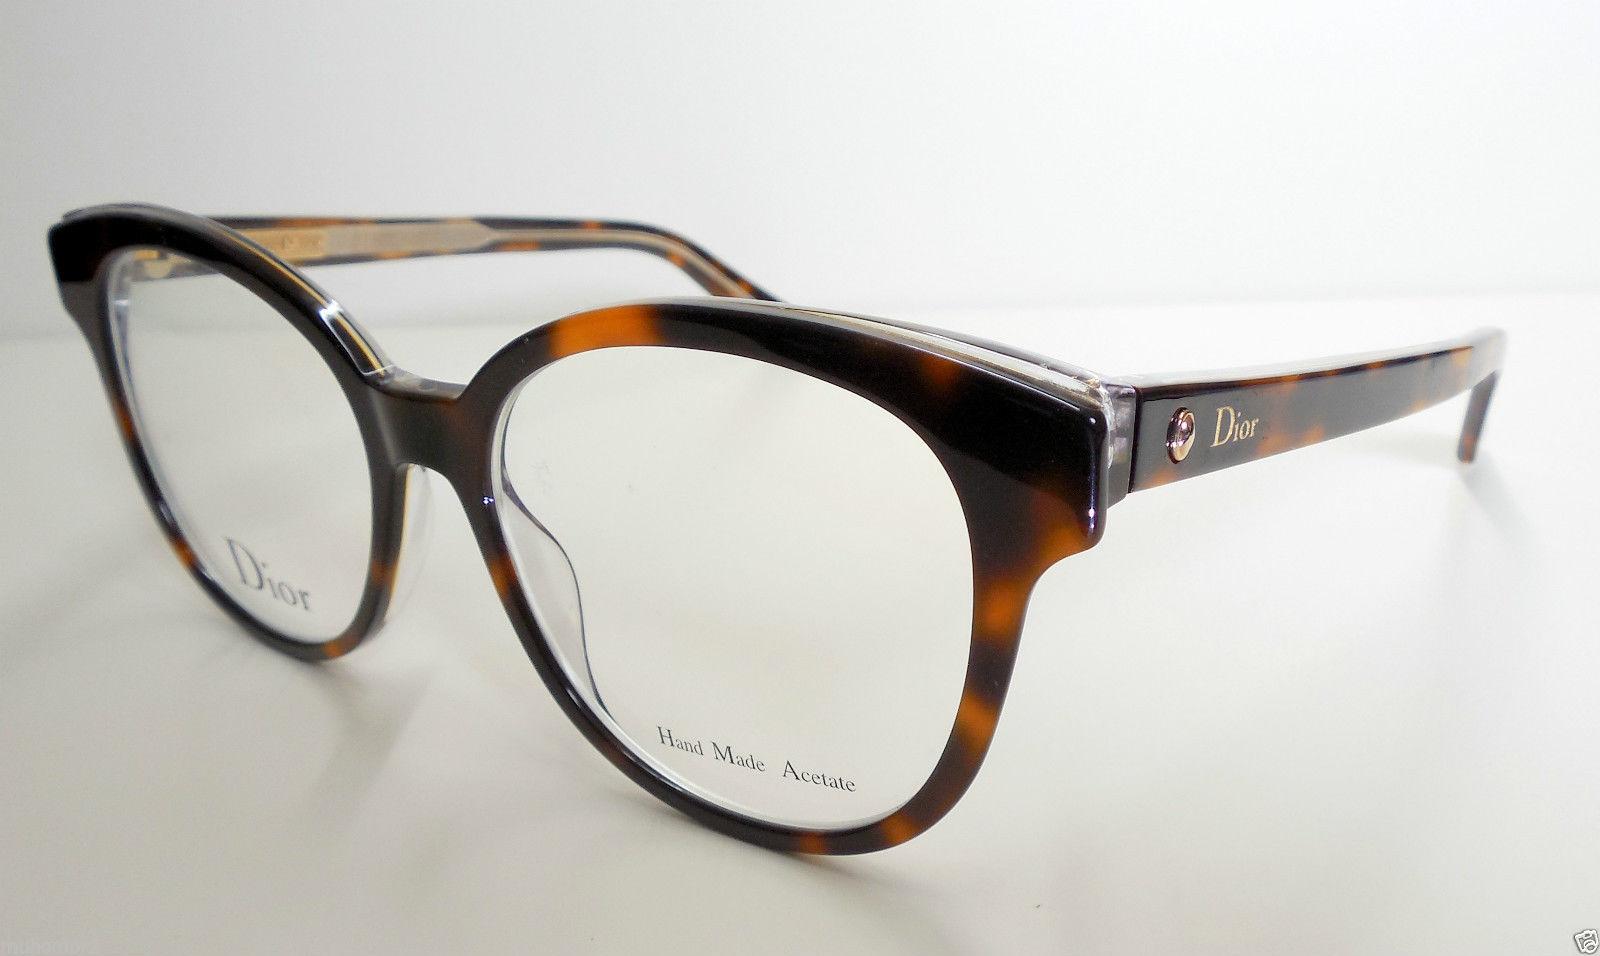 Neu Christian Dior Montaigne 01 G9Q Acetate and 50 similar items